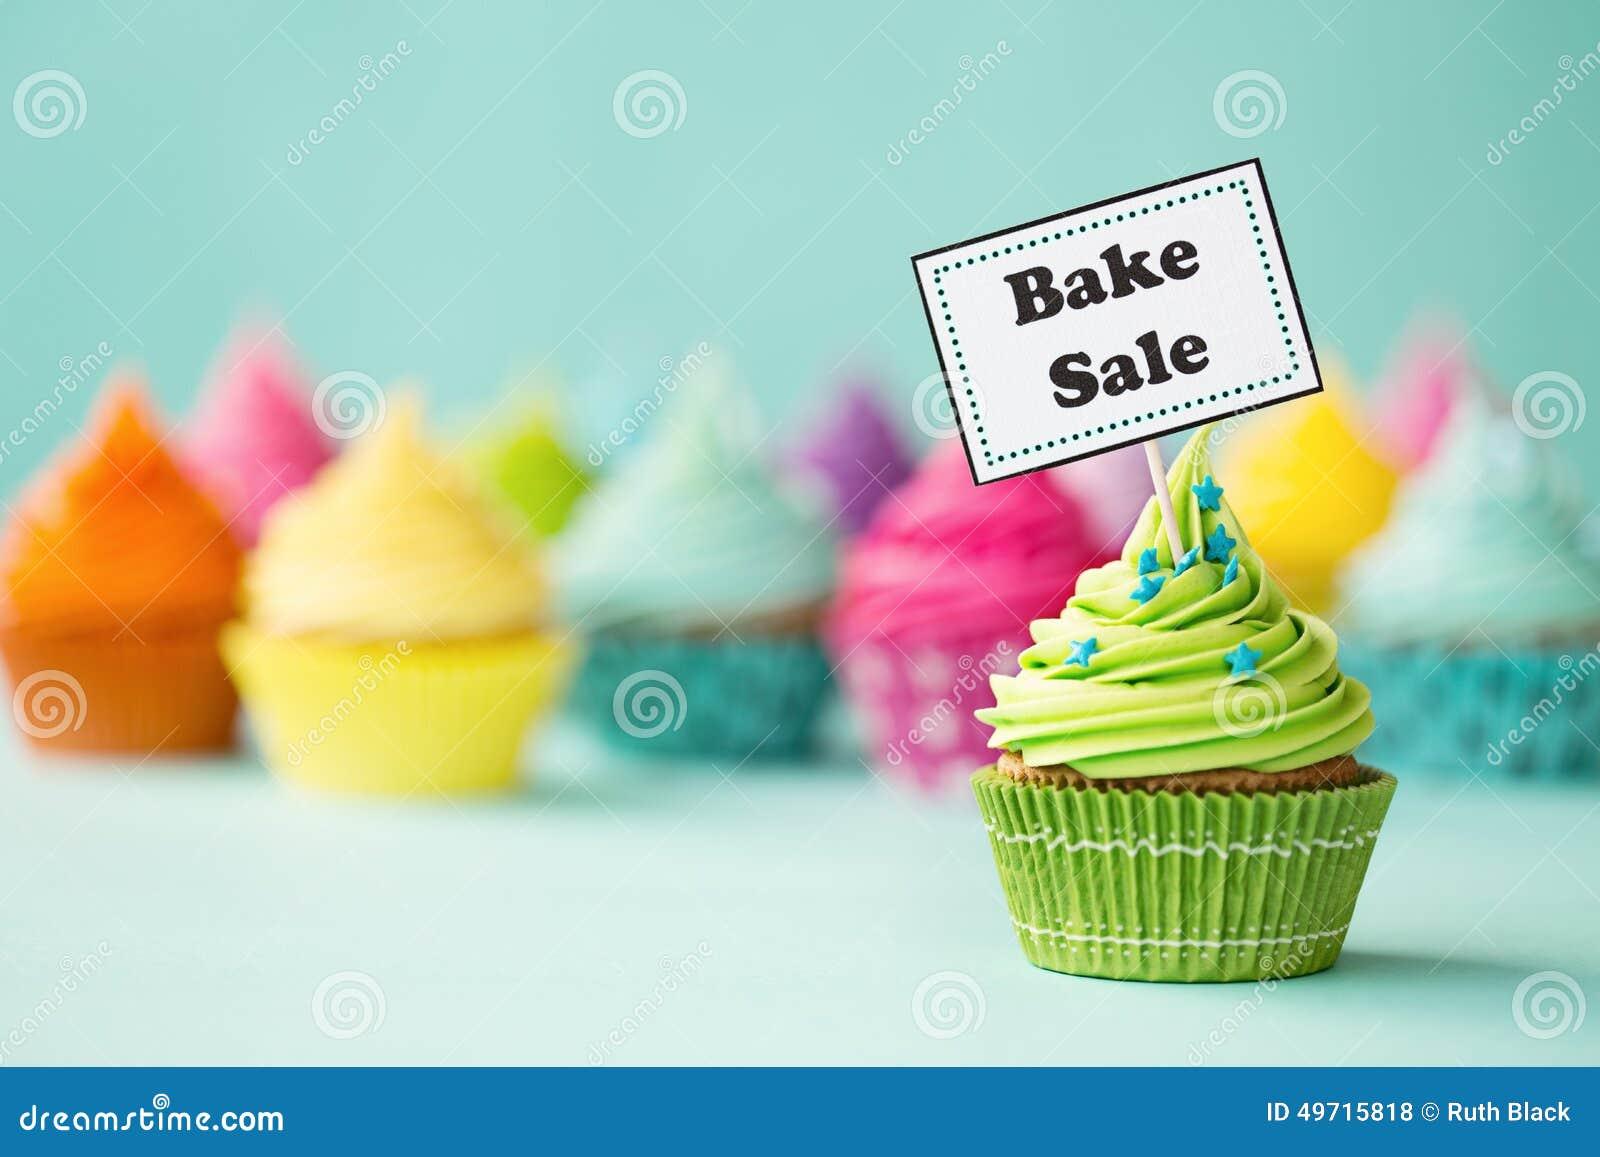 bake signs doc tk bake signs 23 04 2017